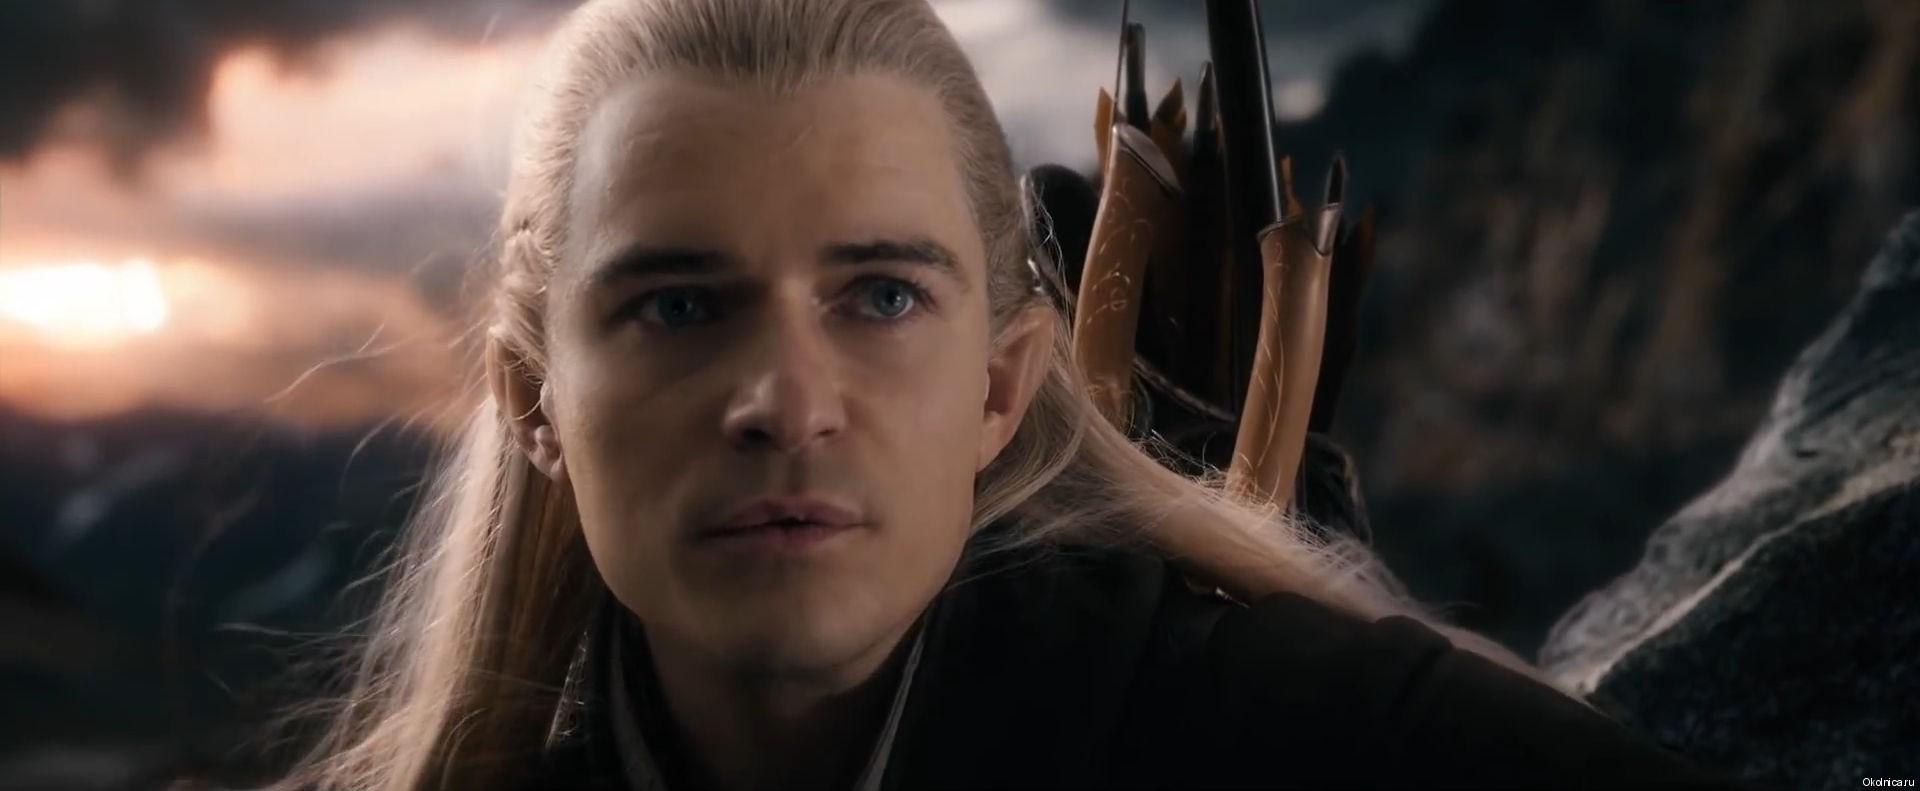 Kino_Hobbit_Bitva_pyati_voinstv_30